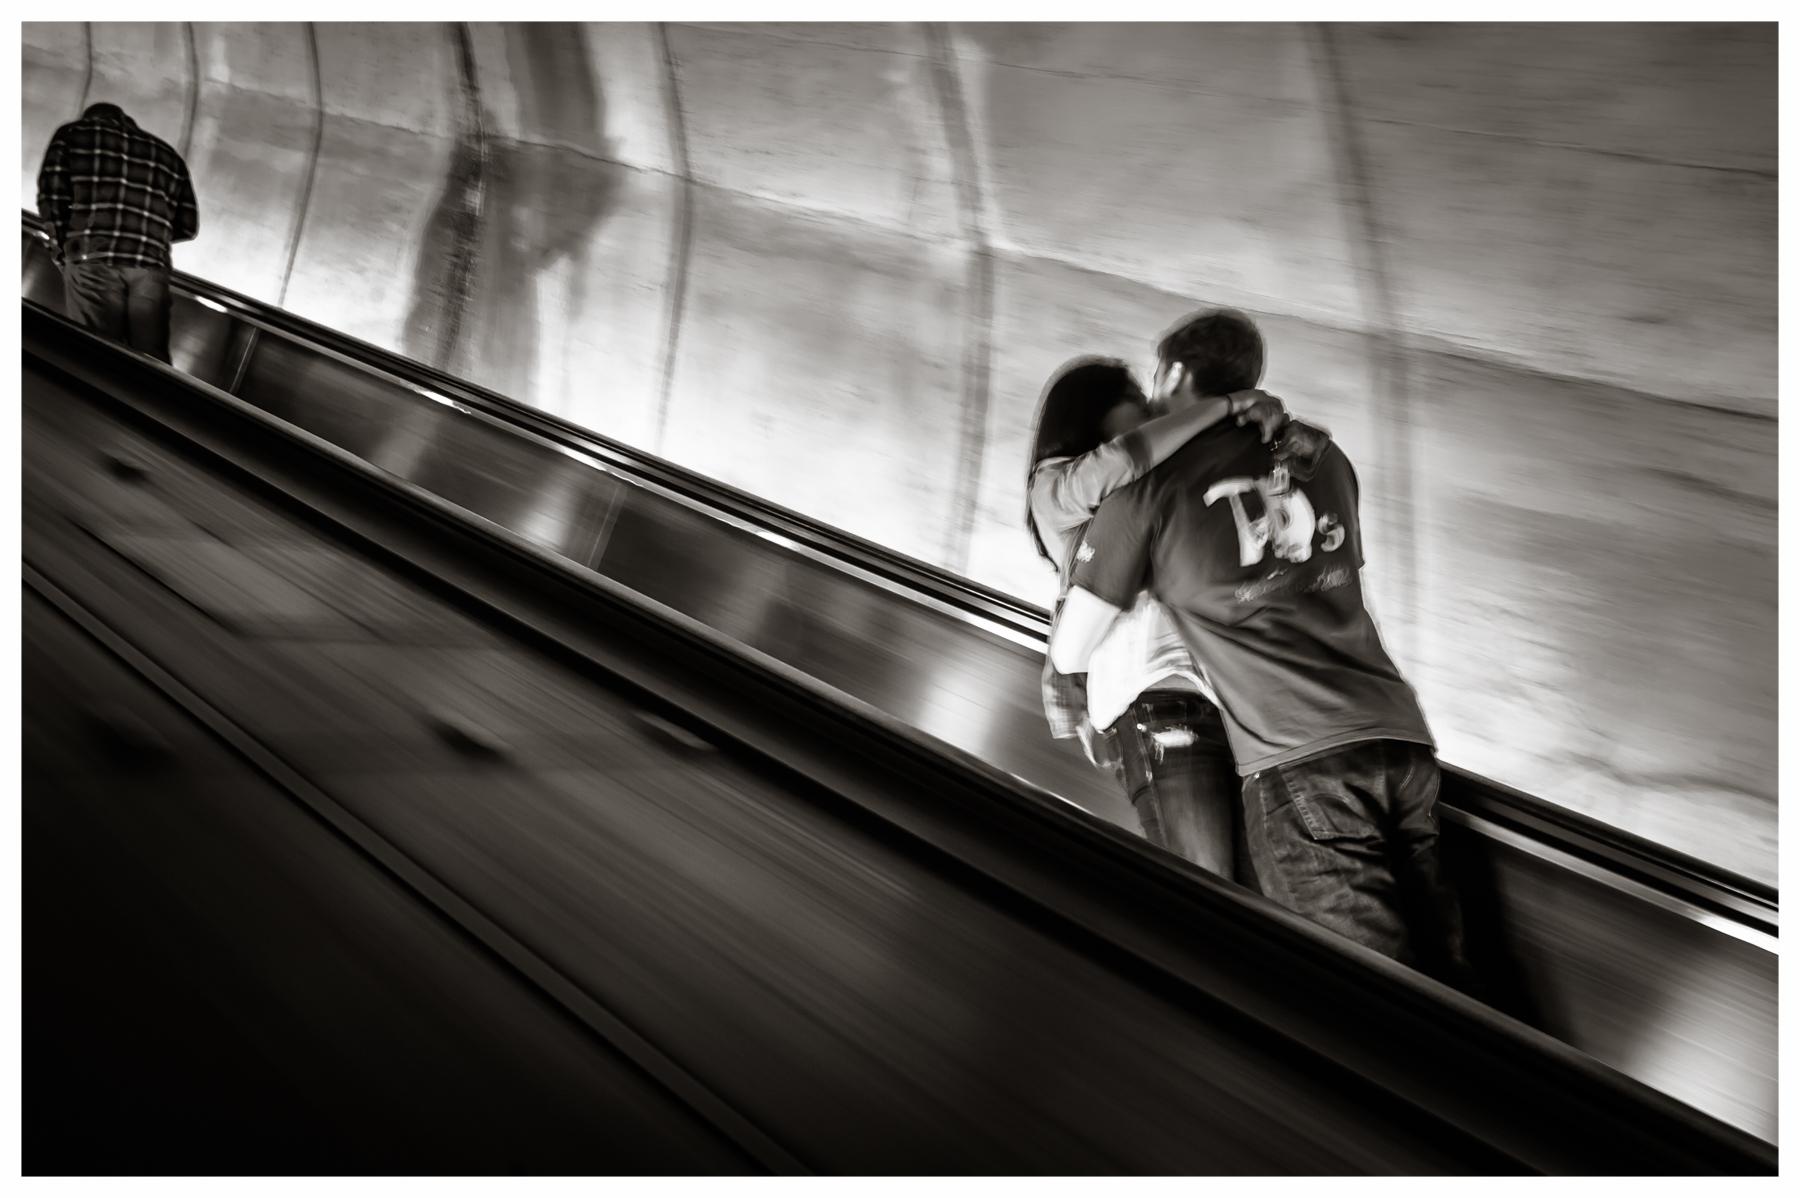 Metro Escalator  Washington, DC 2014